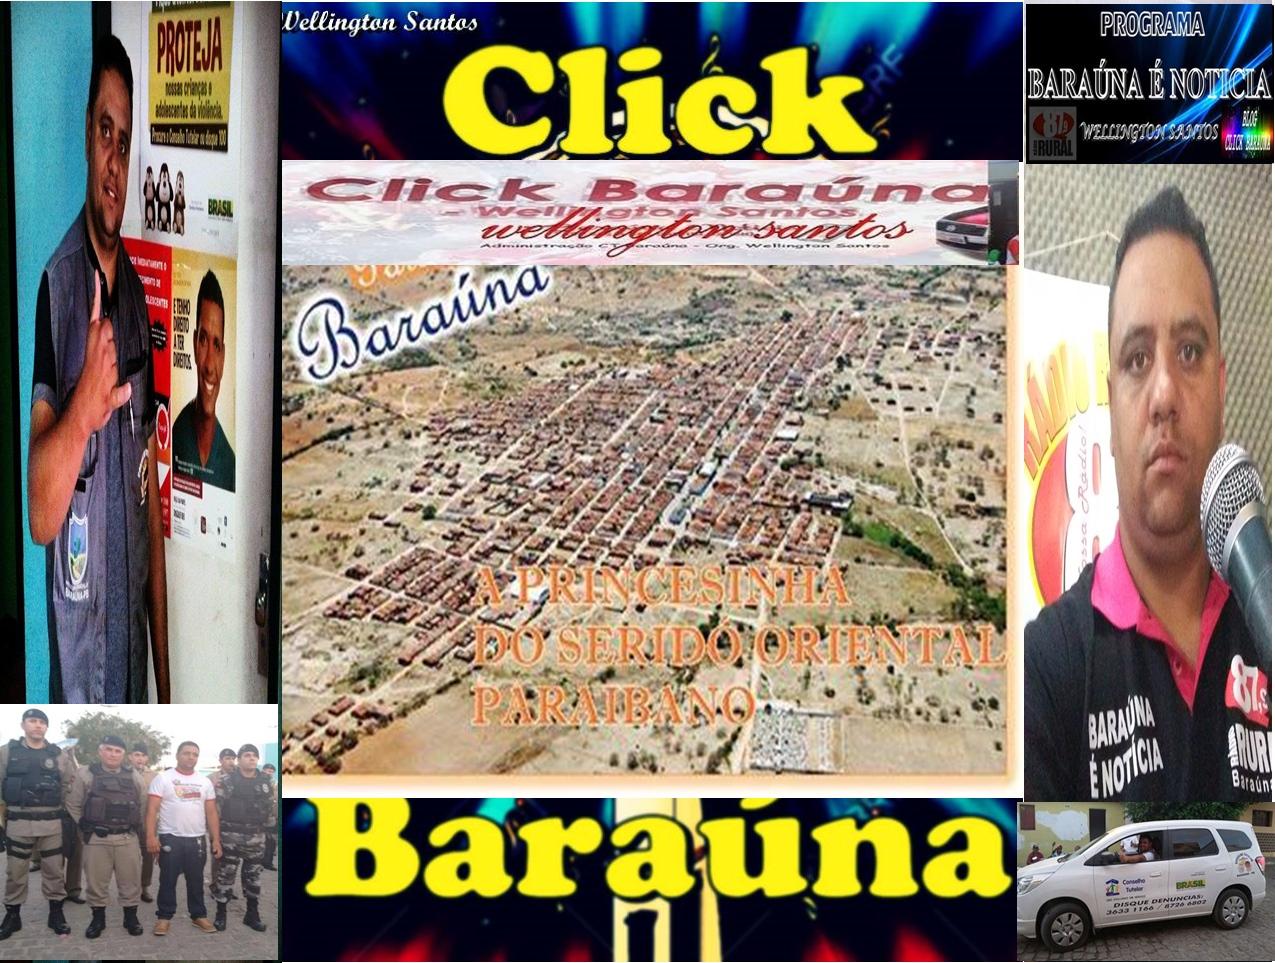 CLICK BARAÚNA-PB - Wellington Santos